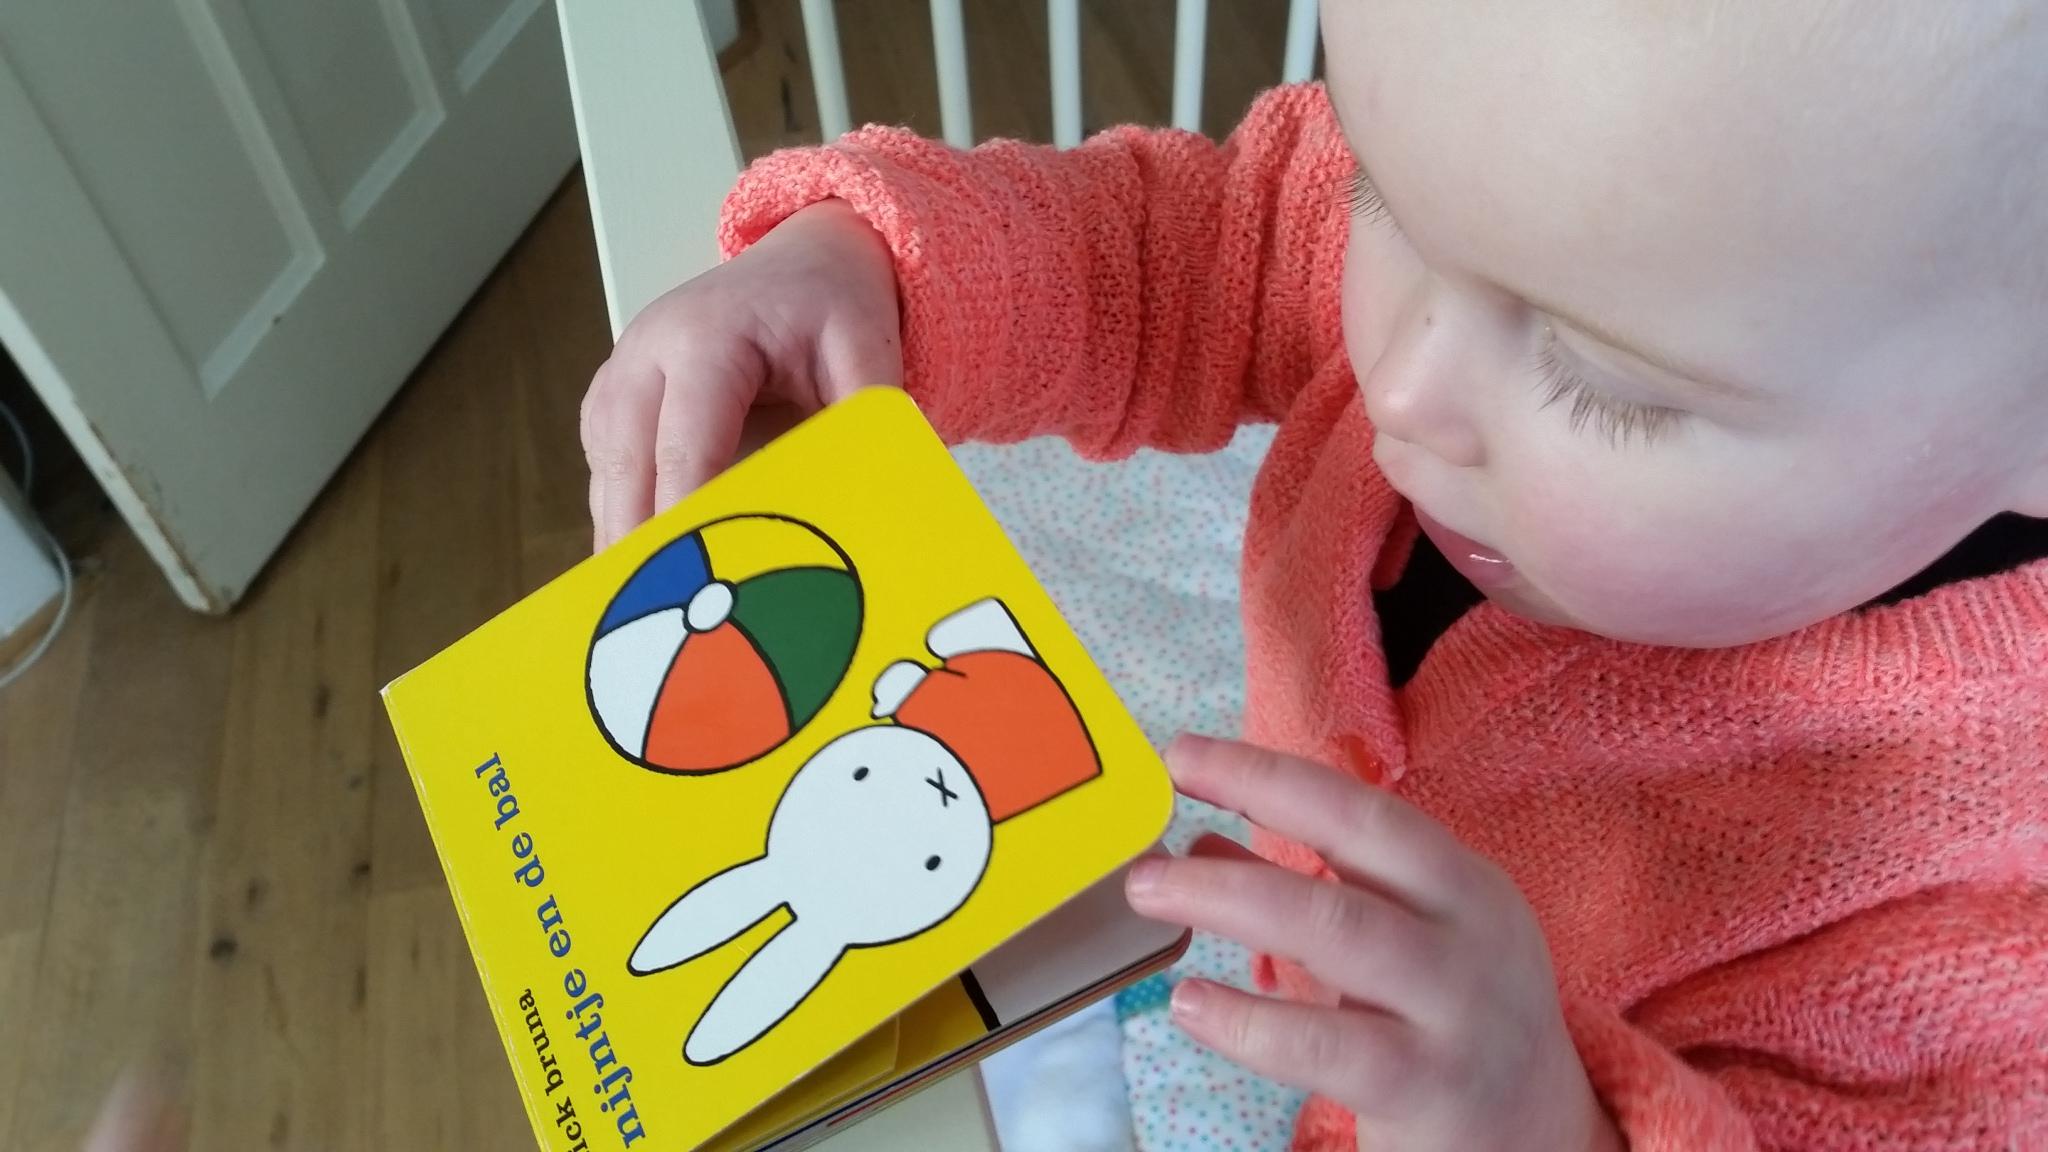 1-16-mercis-boekje-nijntje-en-de-bal-baby-dreumes-peuter-klein-boekje-cadeau-baby-dreumes-leuk-nanny-moeder-annelon-blog-